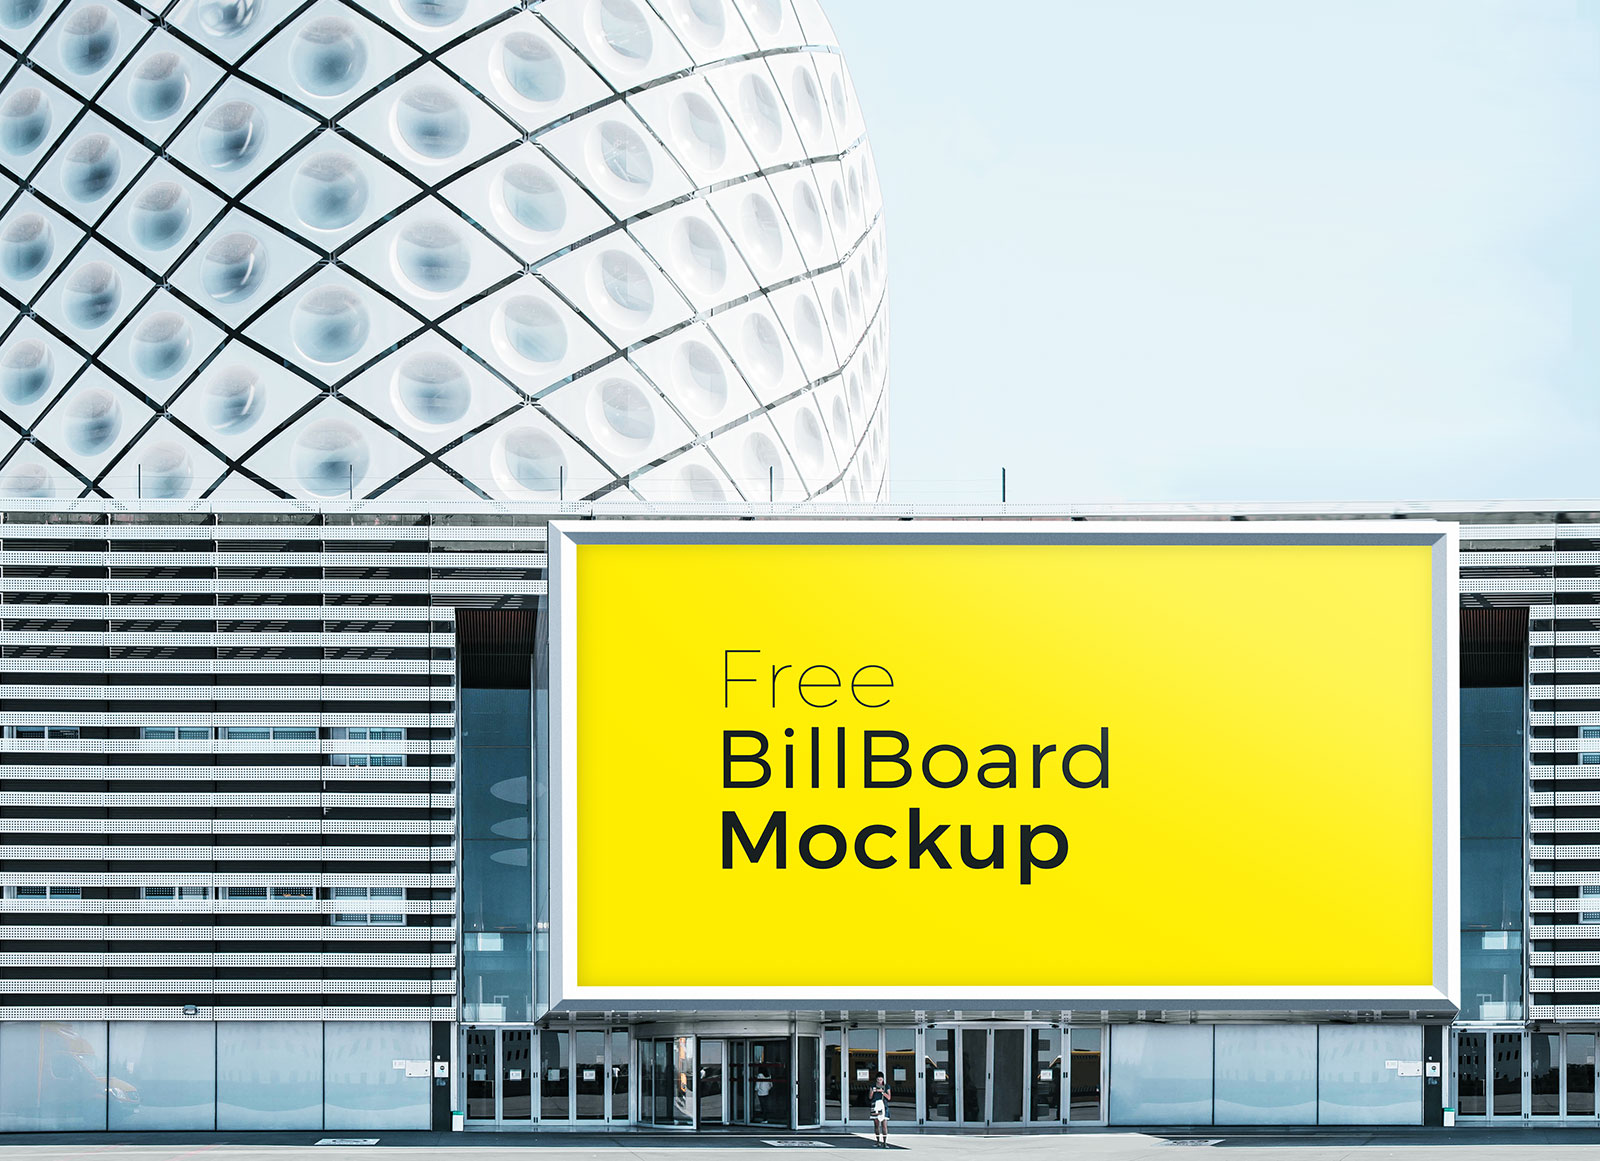 free outdoor advertising wall mounted billboard mockup set